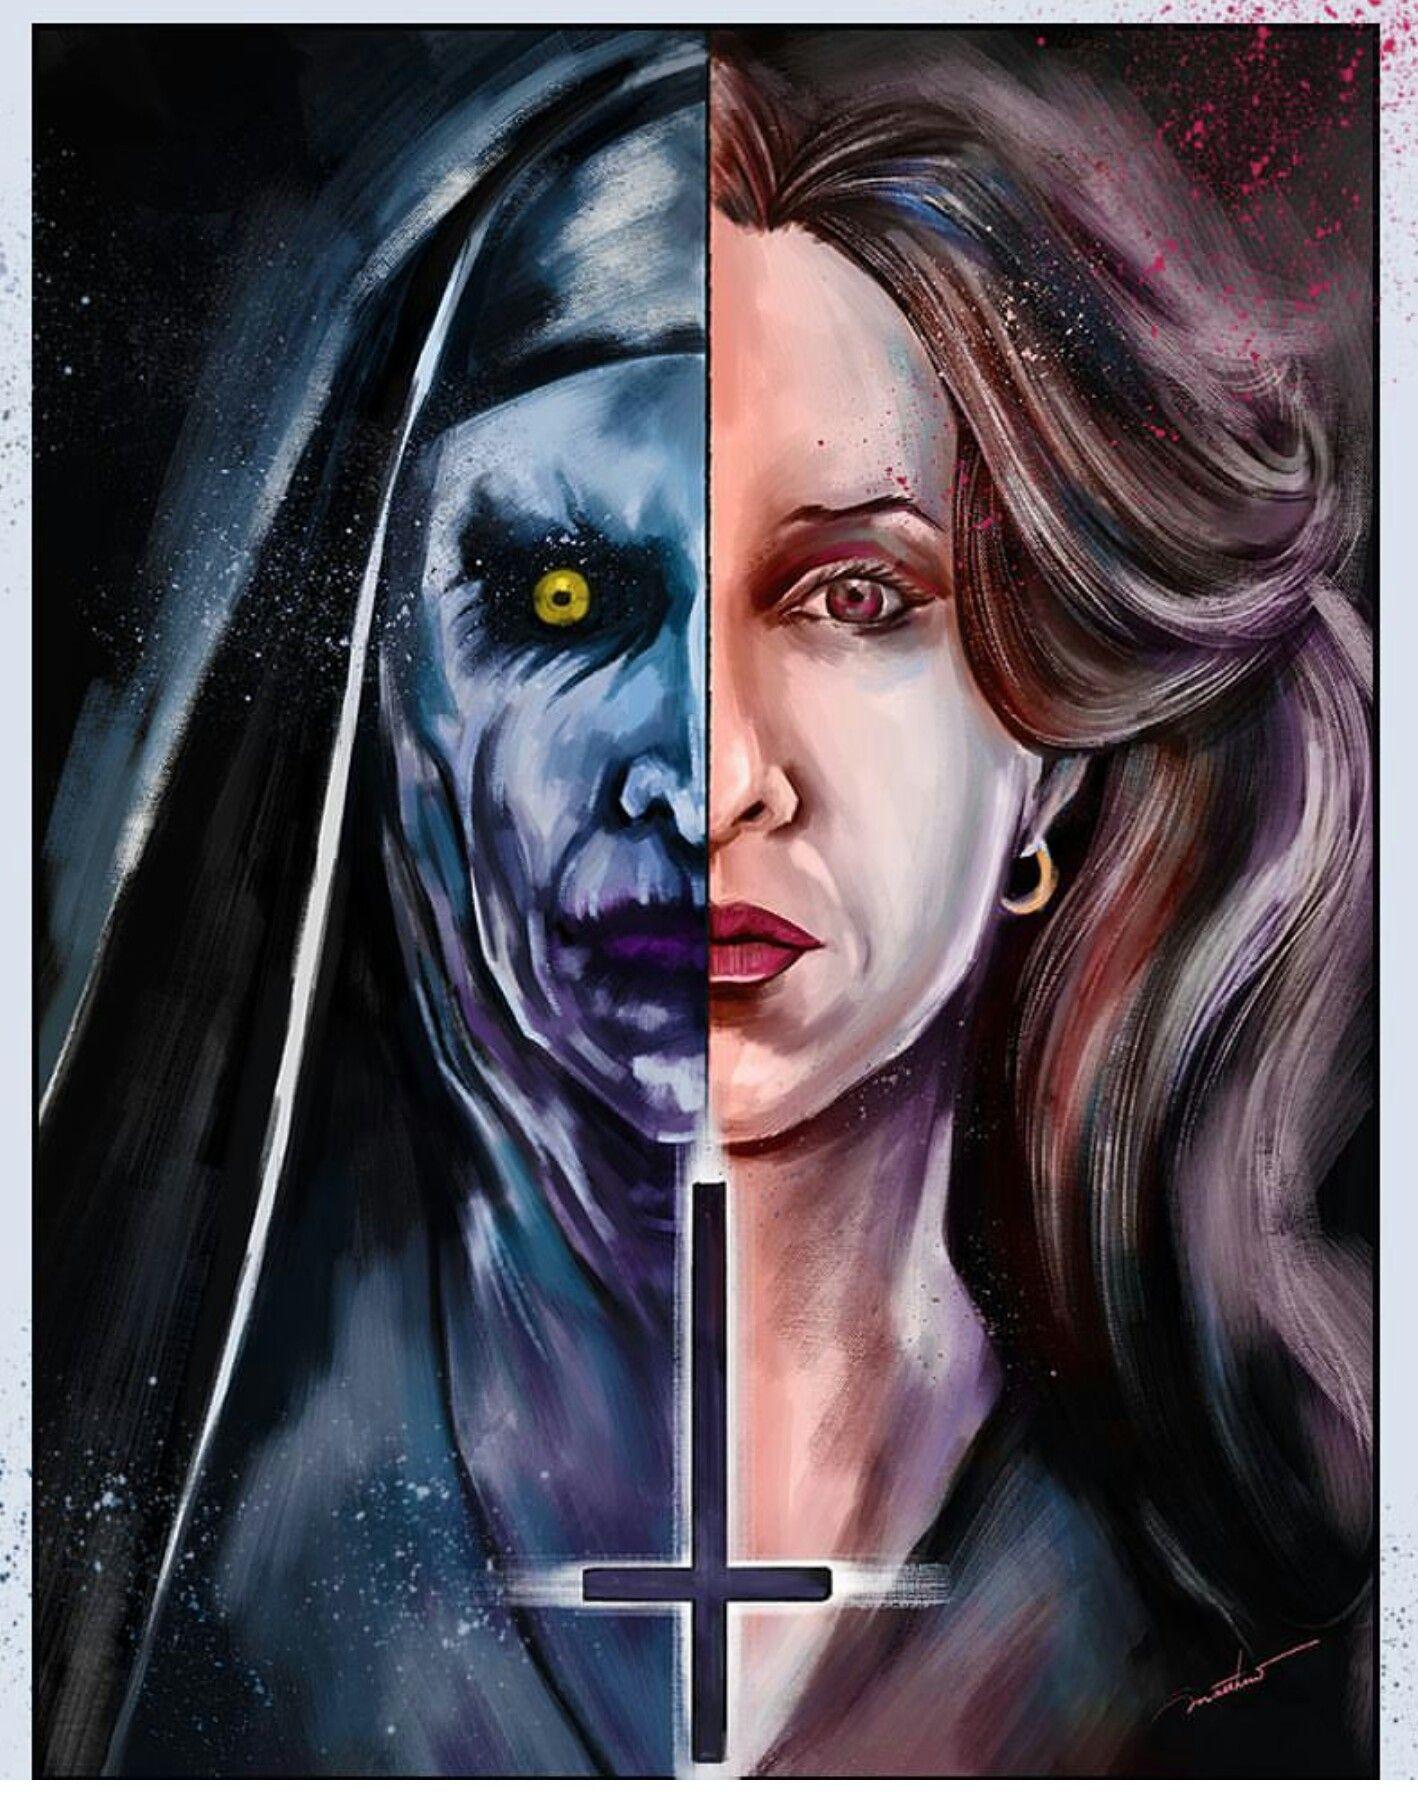 Matthew therrien the conjuring 2 horror movie art